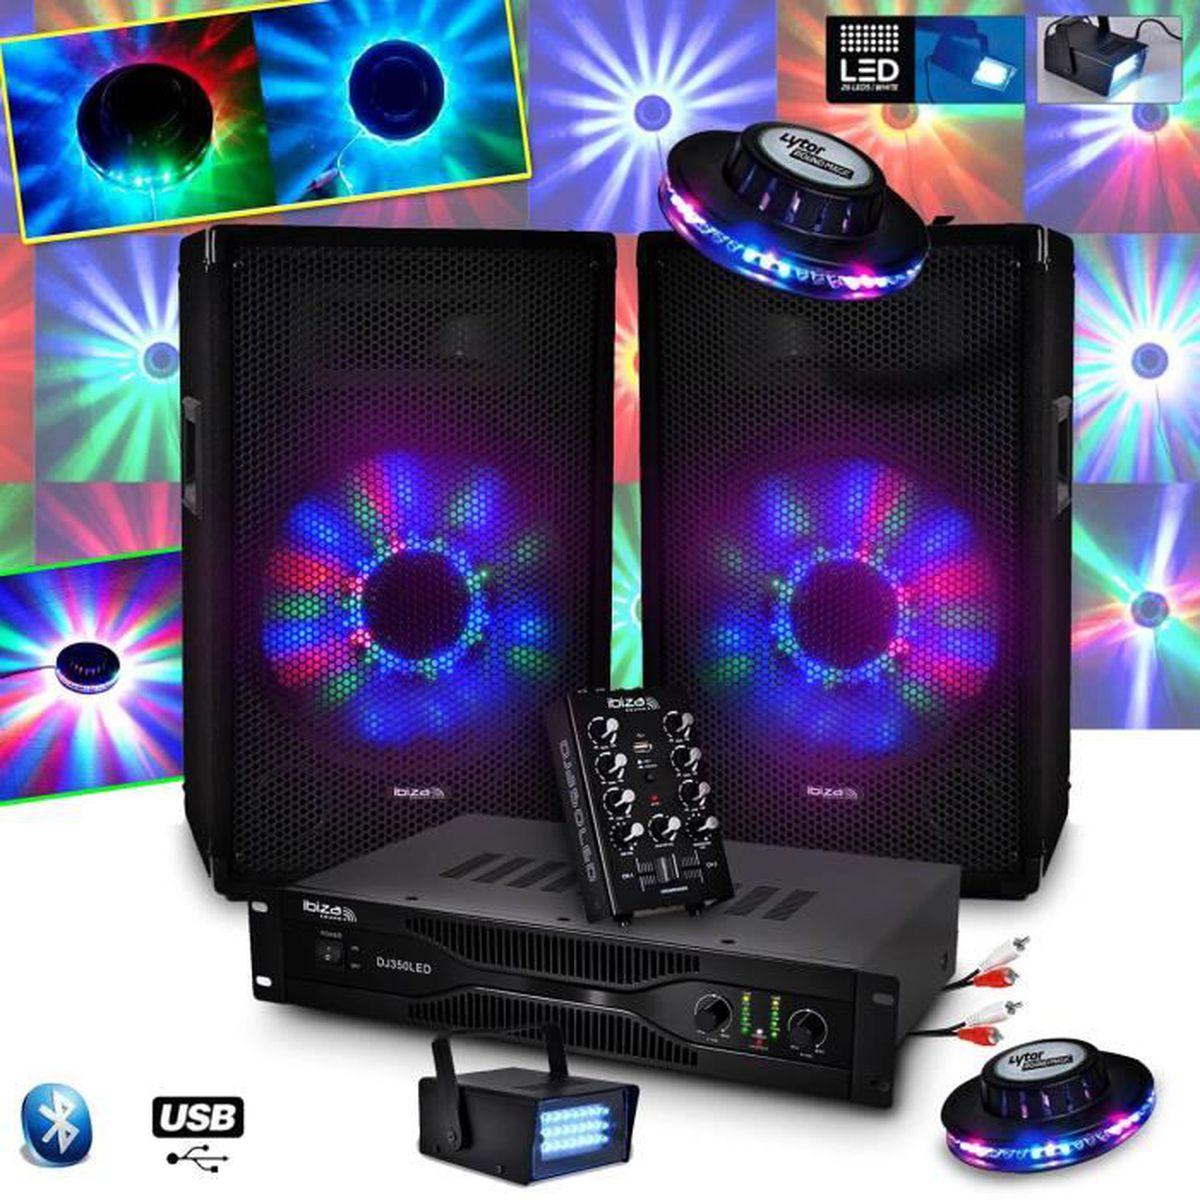 kit sono ibiza dj350led 10 2x250w table mixage usb bt ampli micro 2 effets ovni led. Black Bedroom Furniture Sets. Home Design Ideas